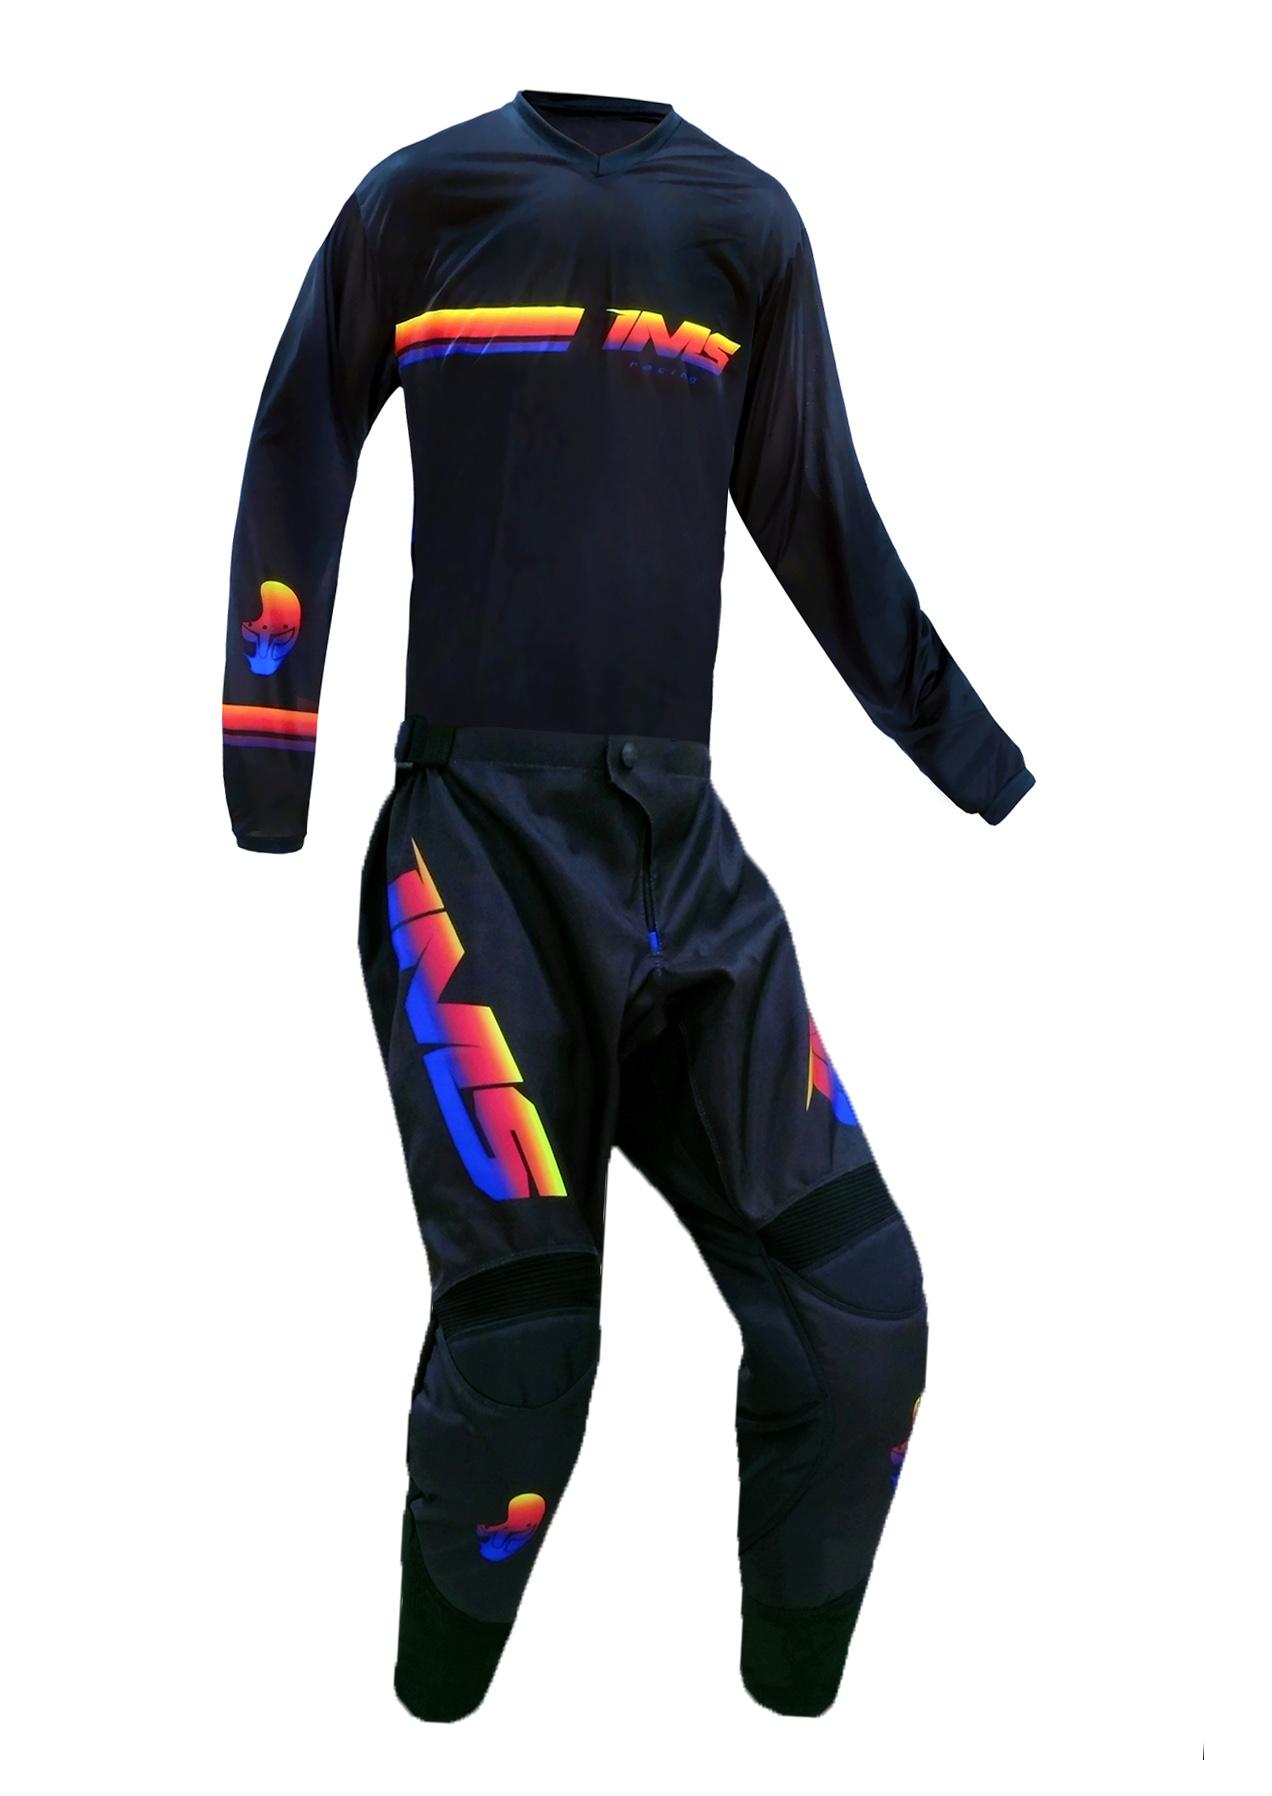 Conjunto Roupa Ims Daytona Camisa Calça Trilha Motocross